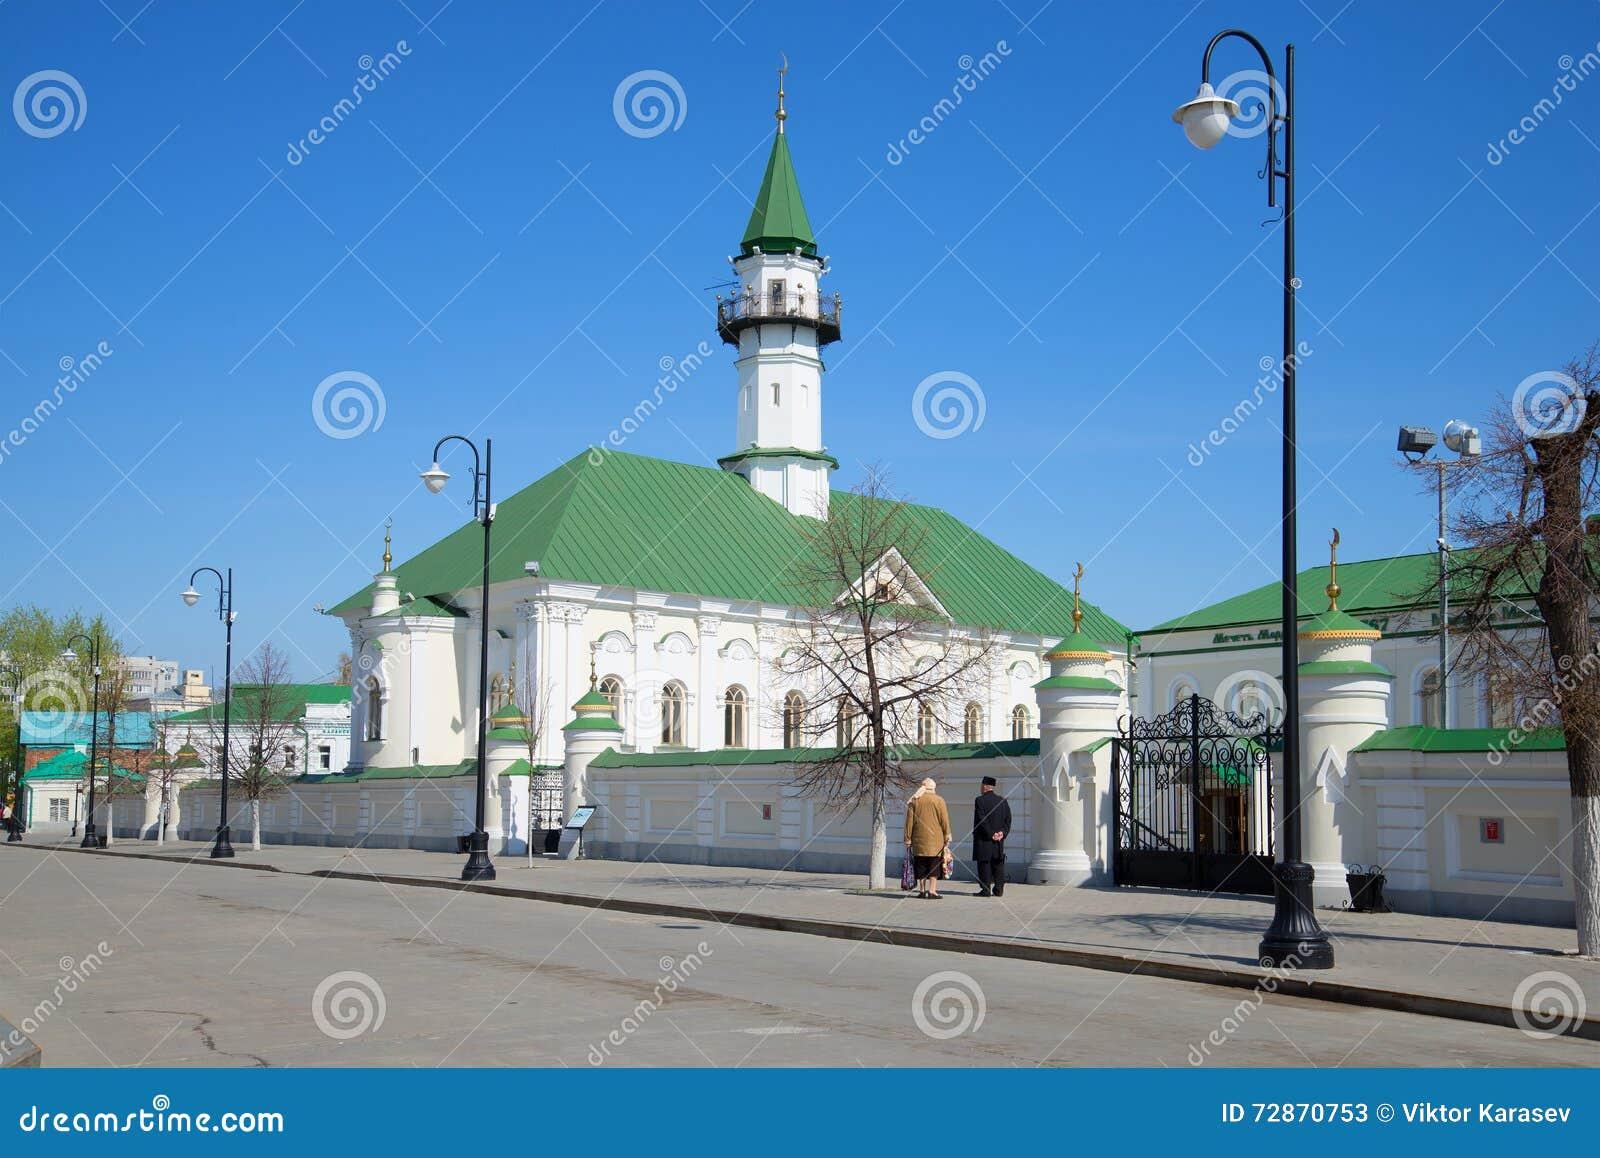 Al Marjani - mosque in Kazan: description, history, relics and shrines 74